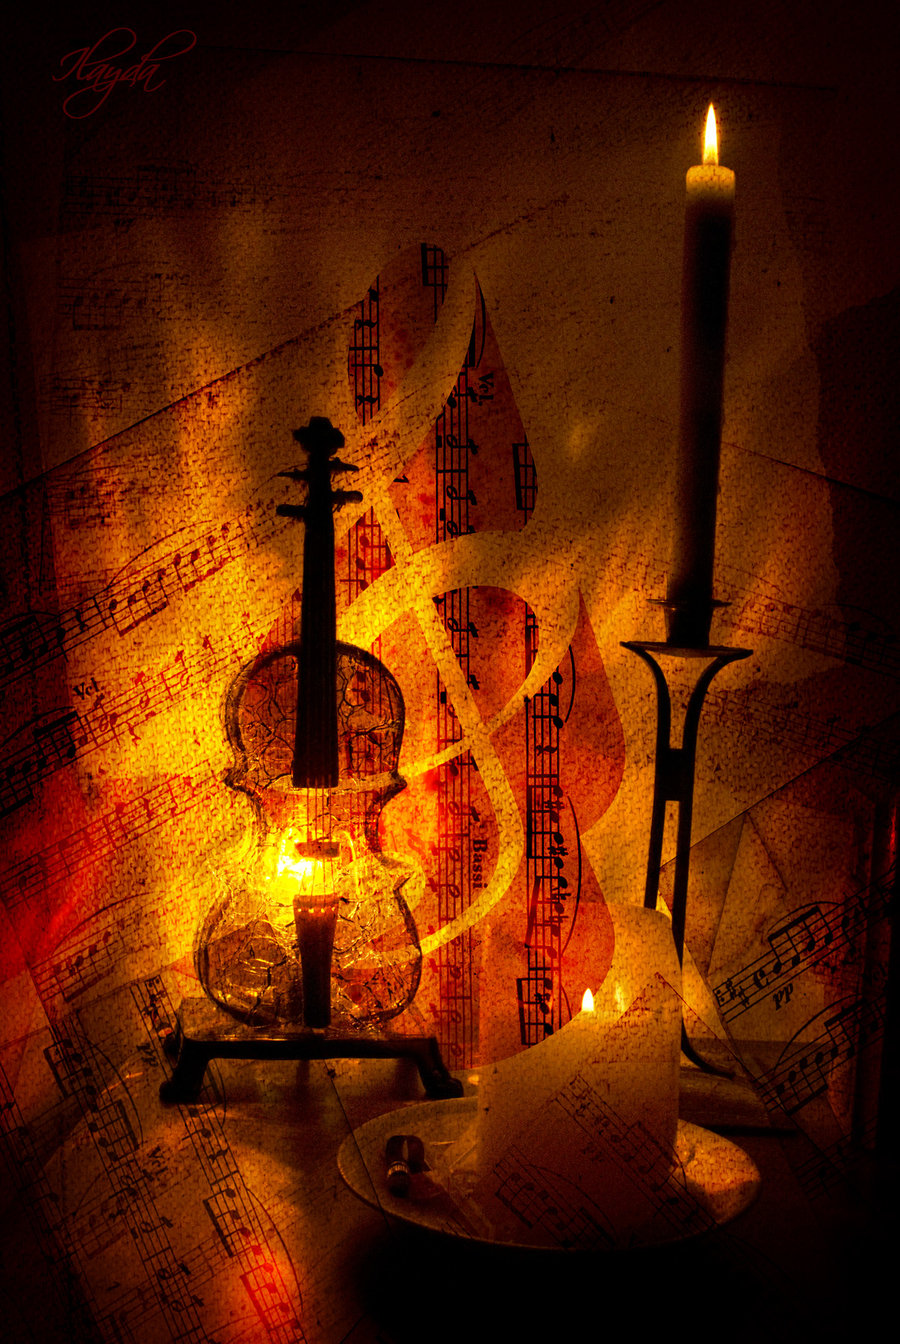 [Music_by_Ilayda_Arts.jpg]